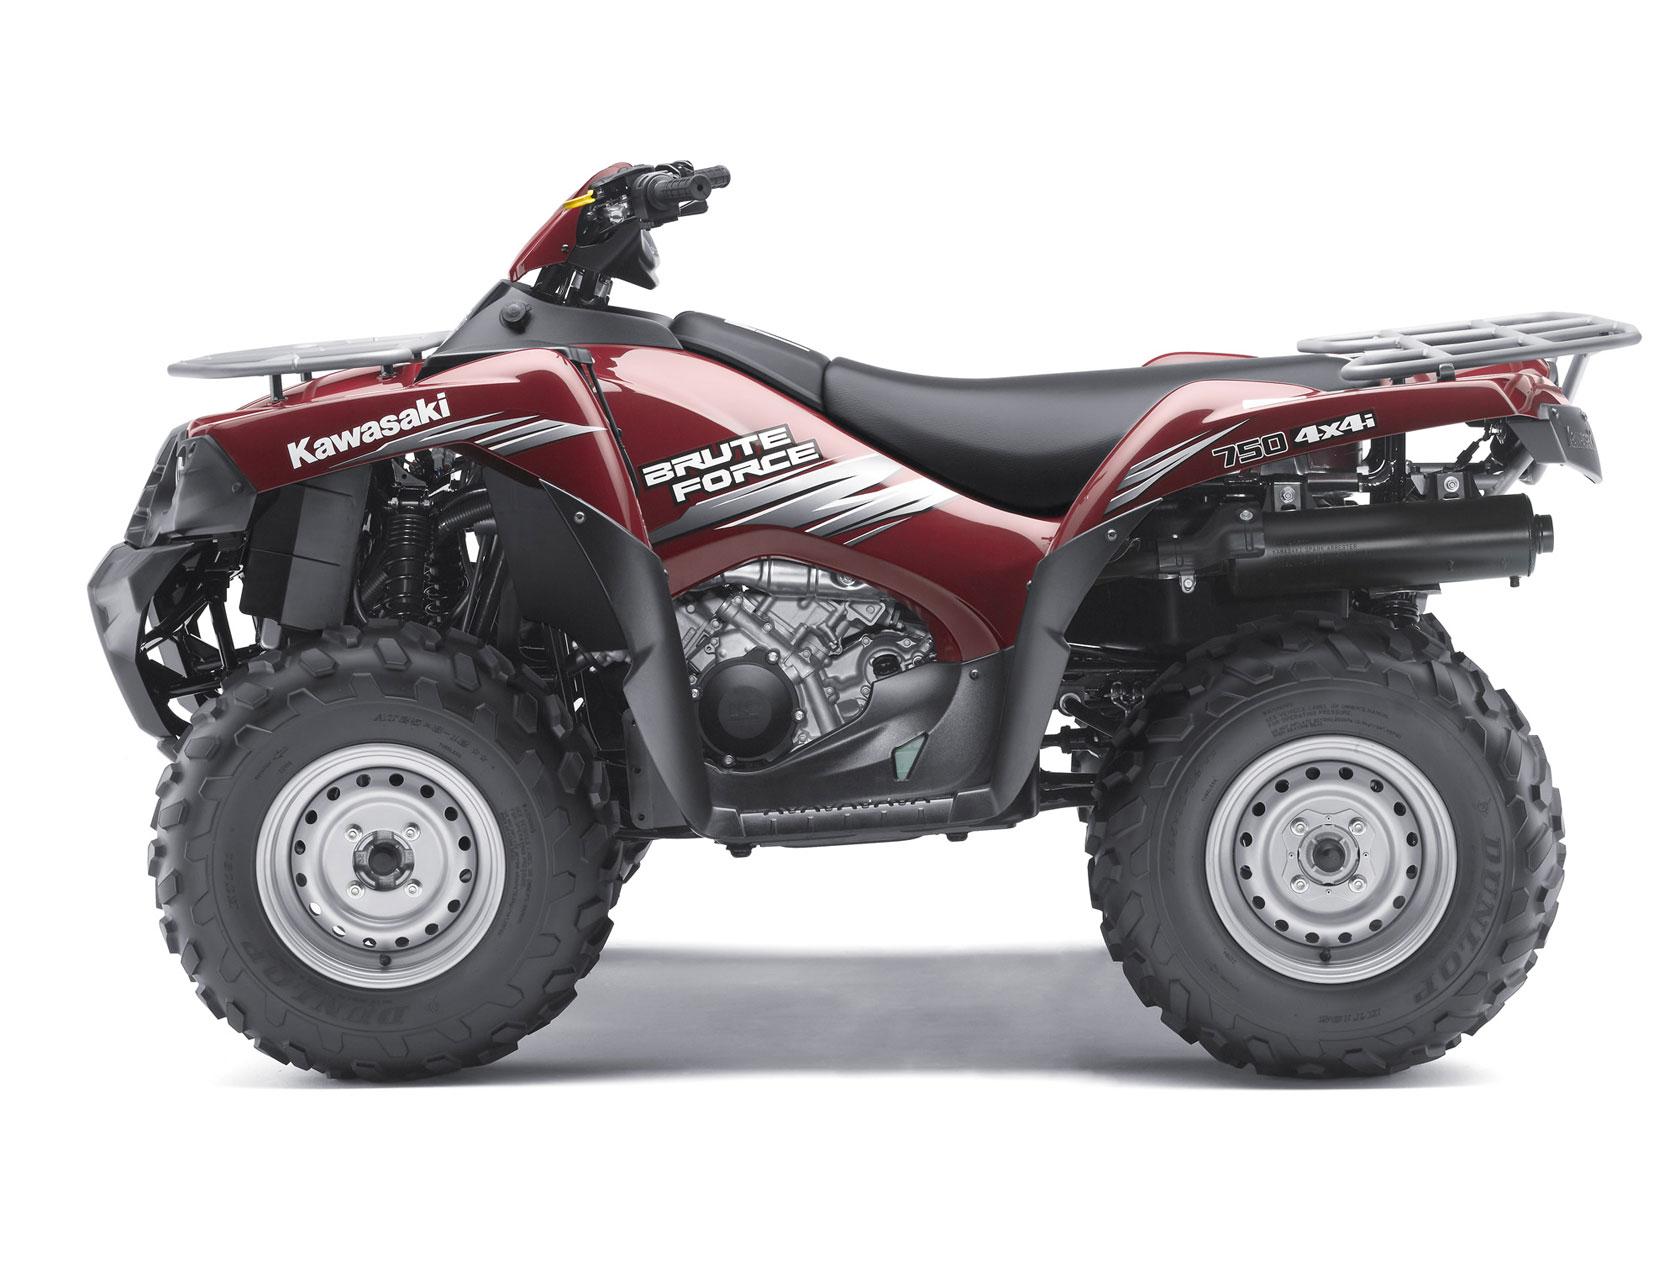 2011 Kawasaki Brute Force 750 Wiring Diagram Worksheet And 2003 360 Engine 4x4i Specs 2010 Autoevolution Rh Com Bayou 220 Parts